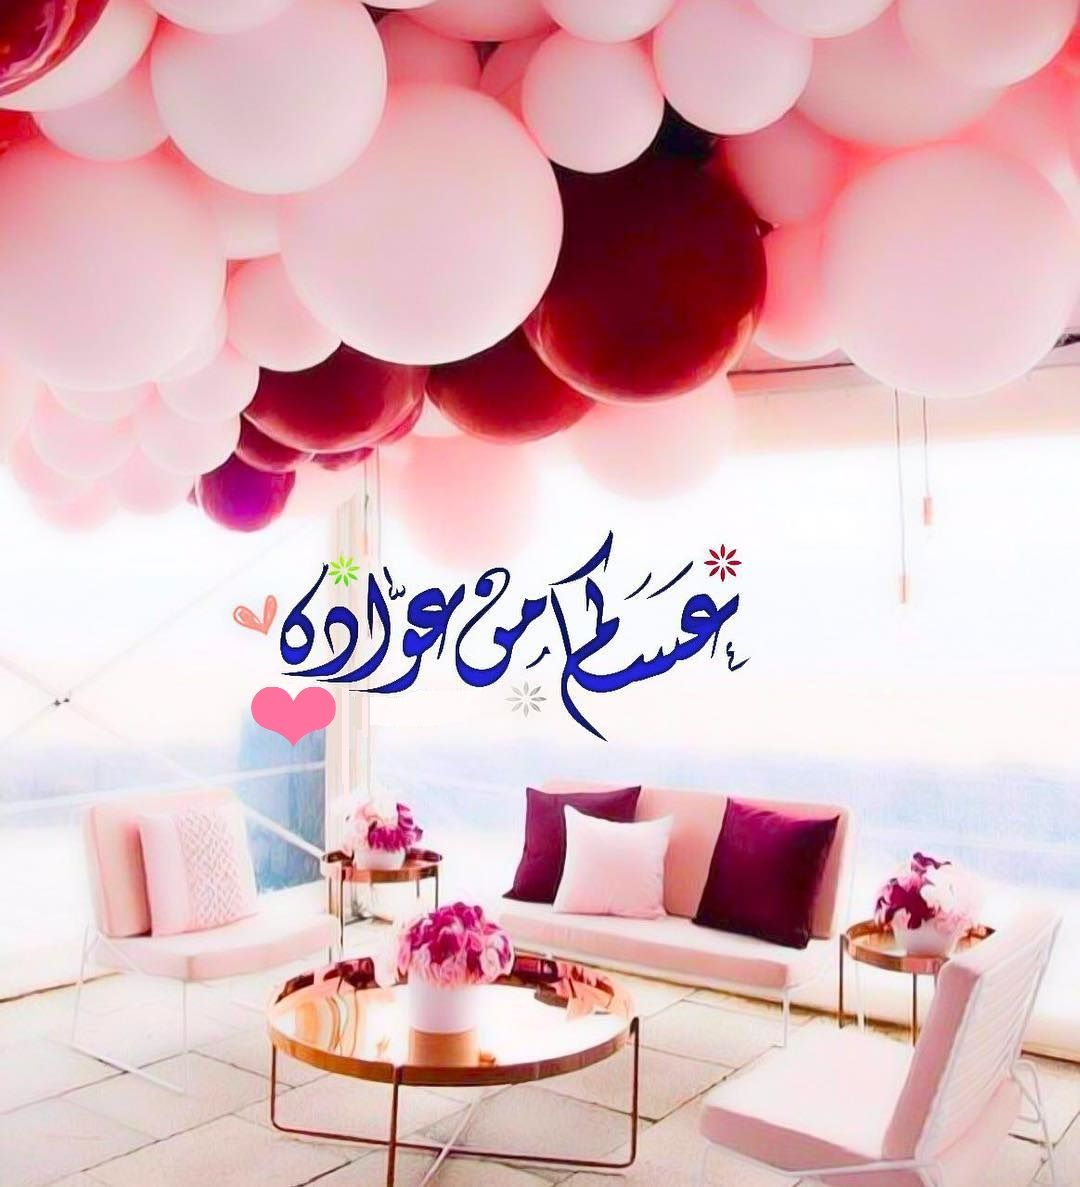 Pin By Mnmn171 Mnmn171 On بطـاقـات صبـاحيـة واسـلاميـة Islamic Celebrations Eid Greetings Eid Mubarak